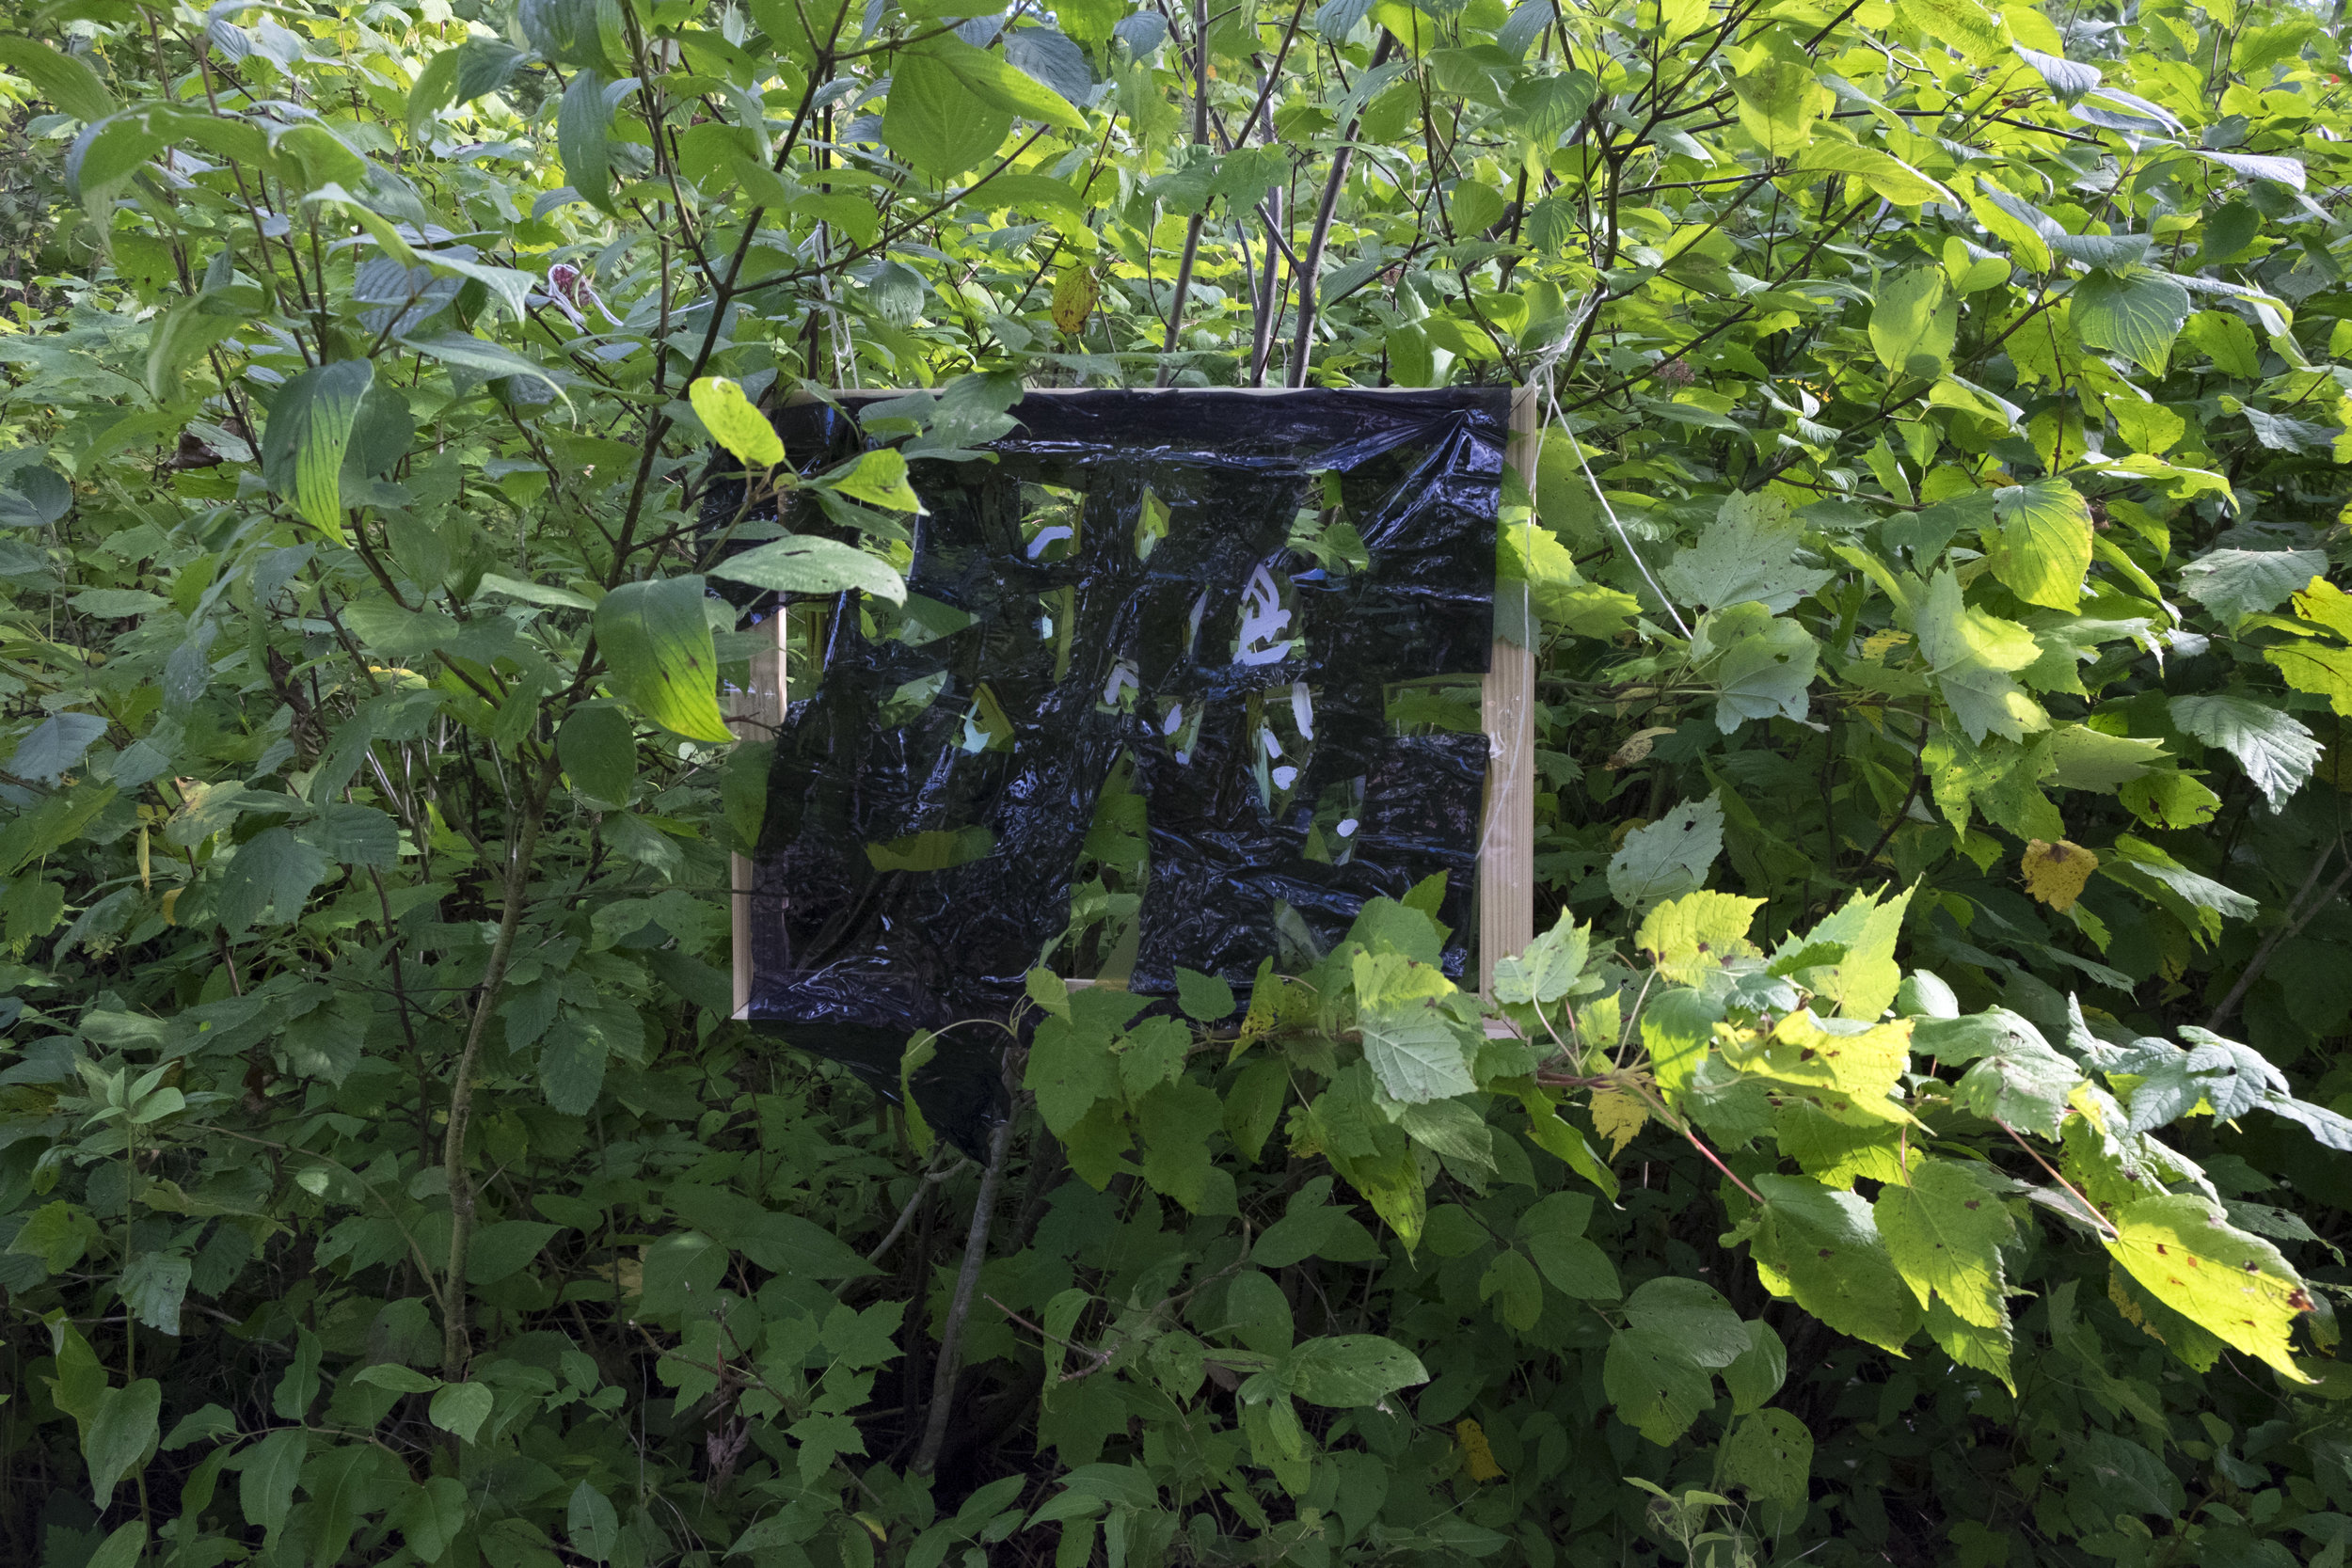 09.08.16 Reveal: Tofte Lake (Leaves)